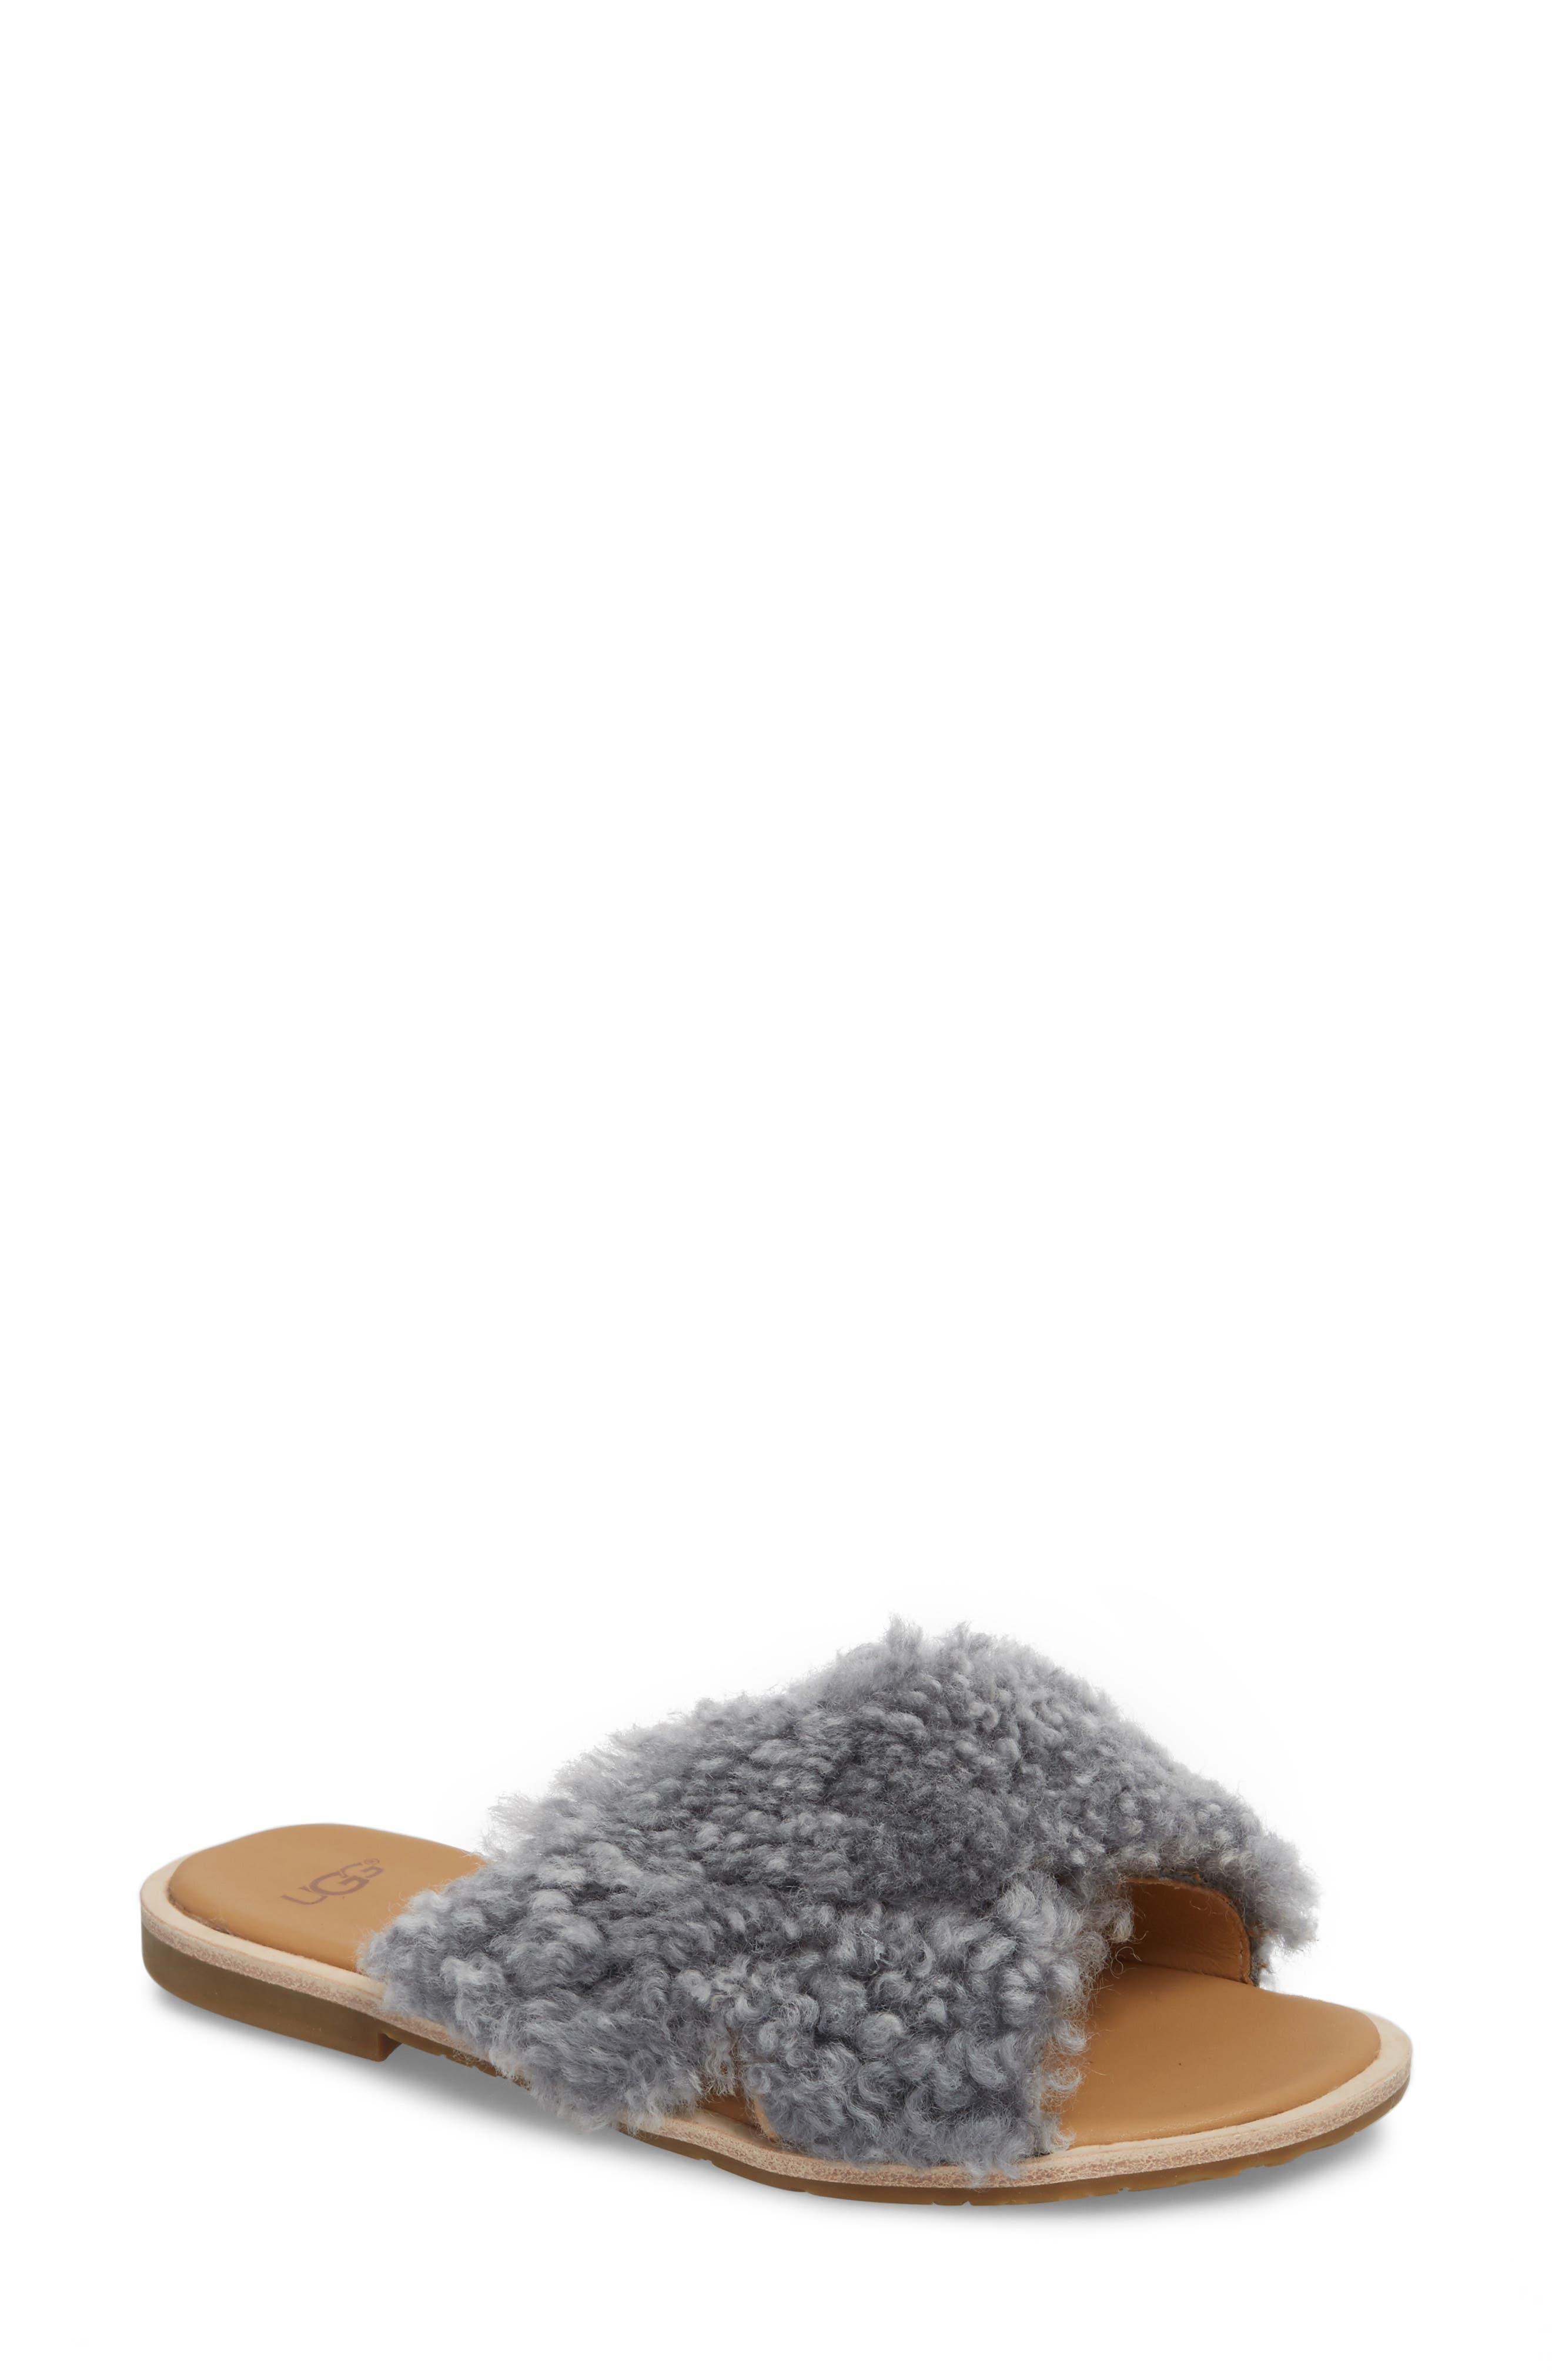 Joni Genuine Shearling Slide Sandal,                             Main thumbnail 1, color,                             Lude Grey